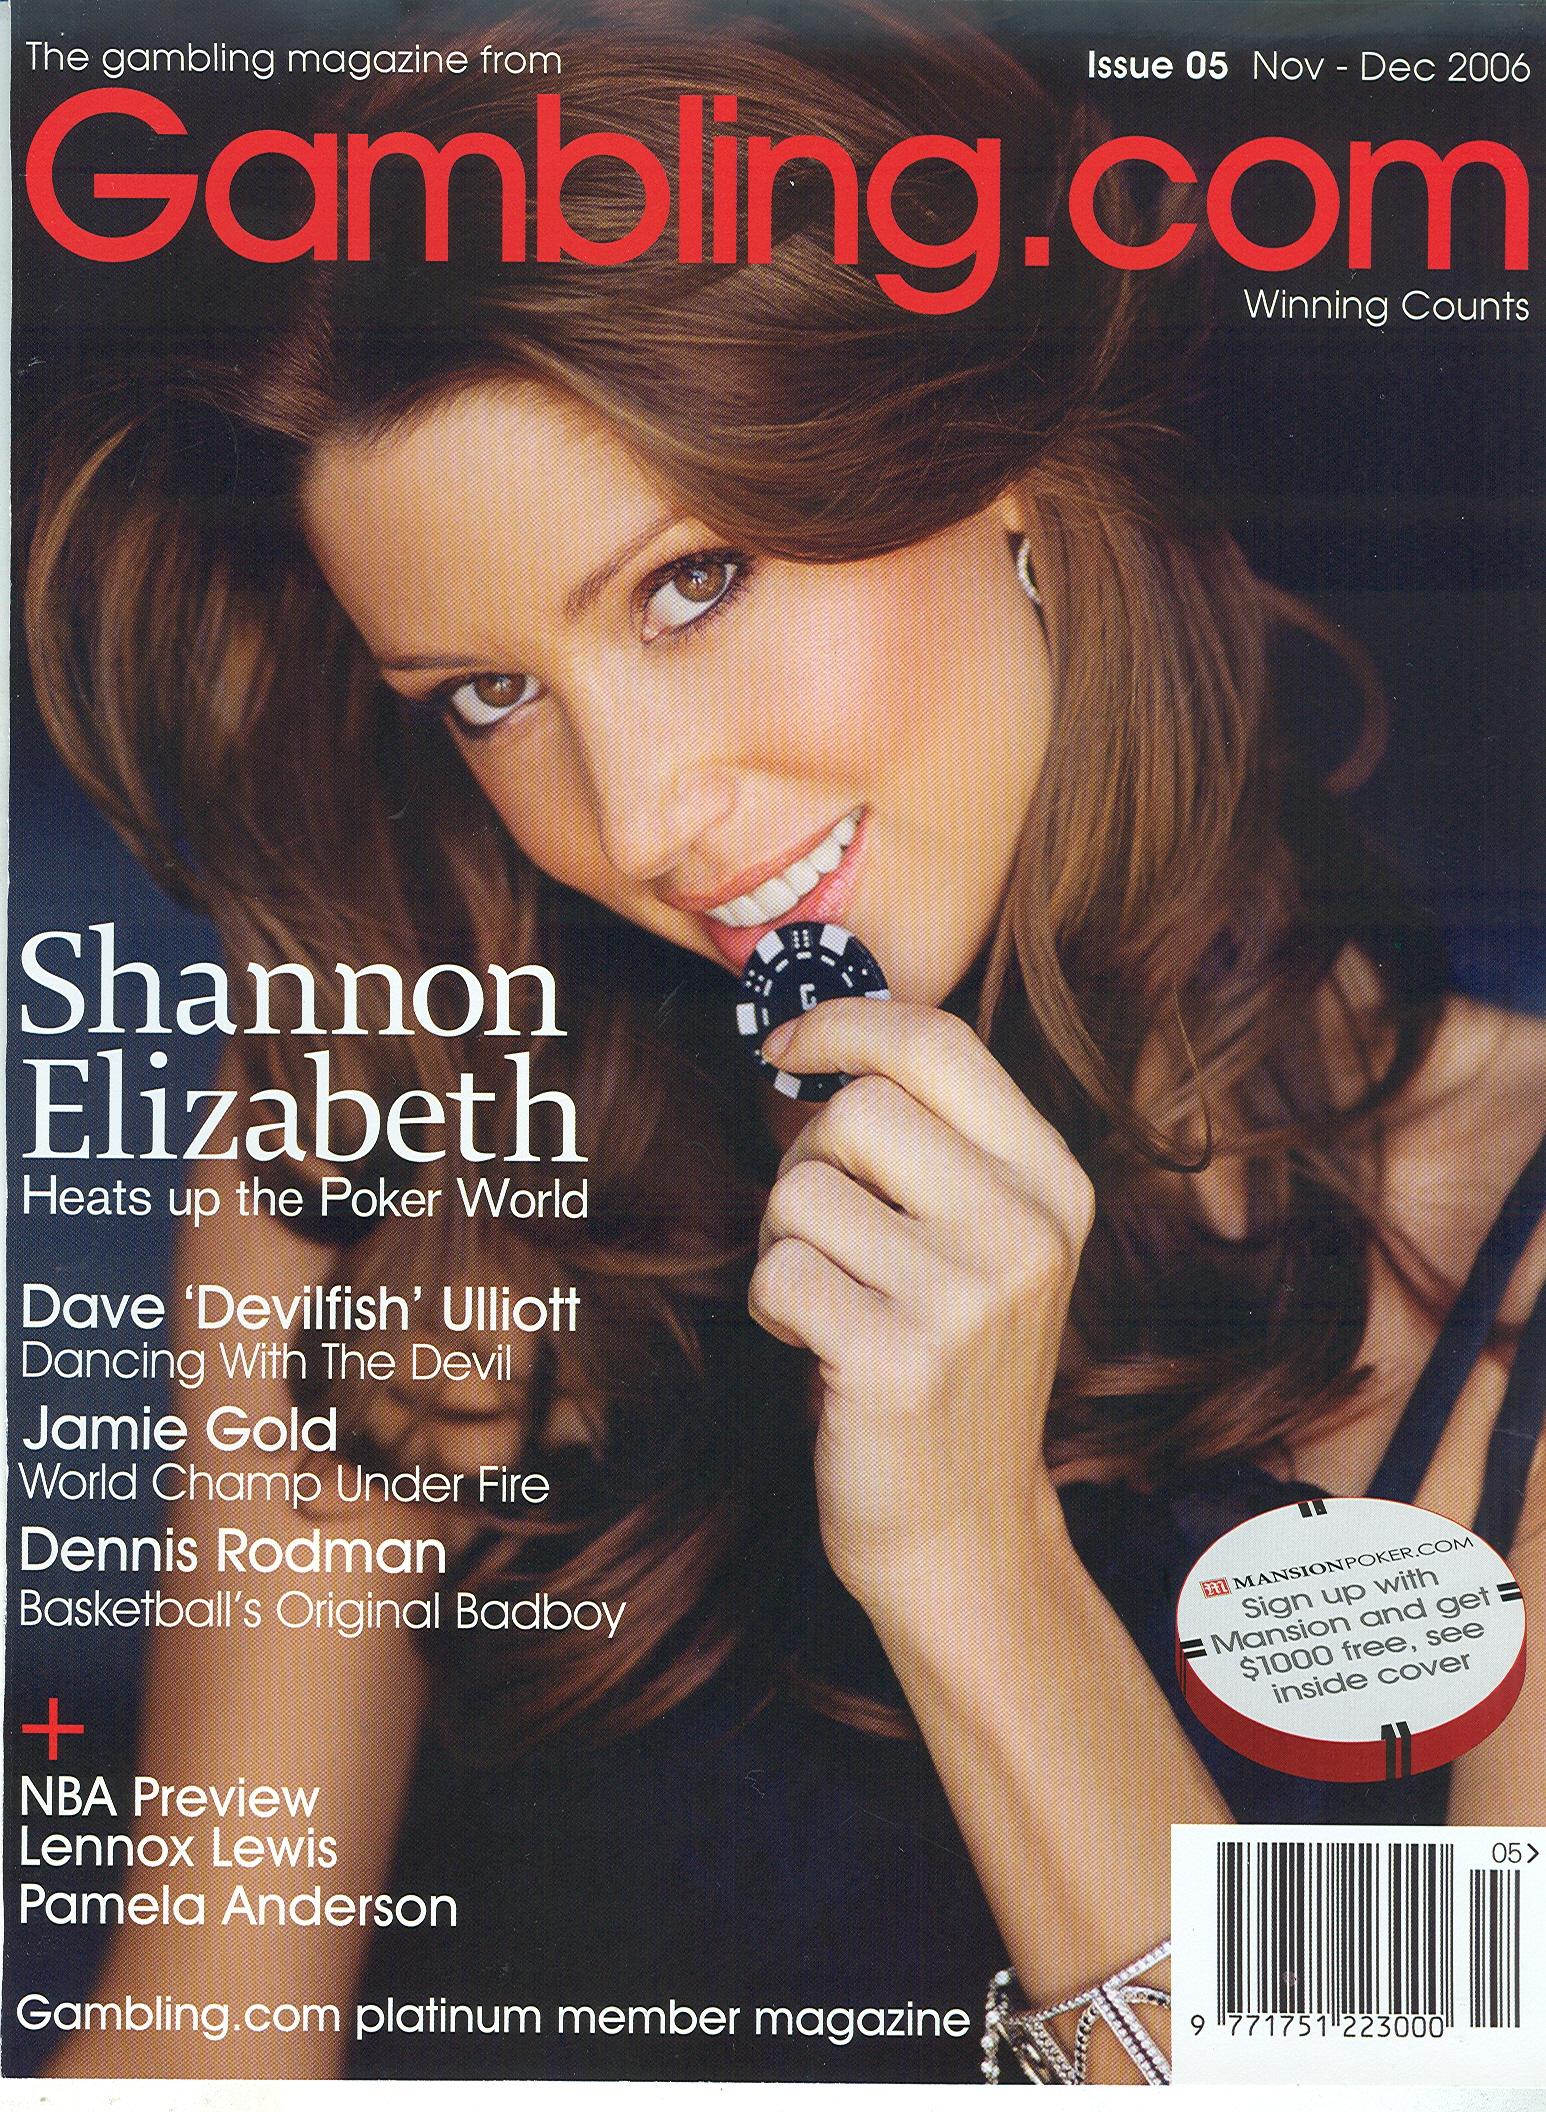 SE_Gambling Magazine_Nov Dec 2006_1.jpg